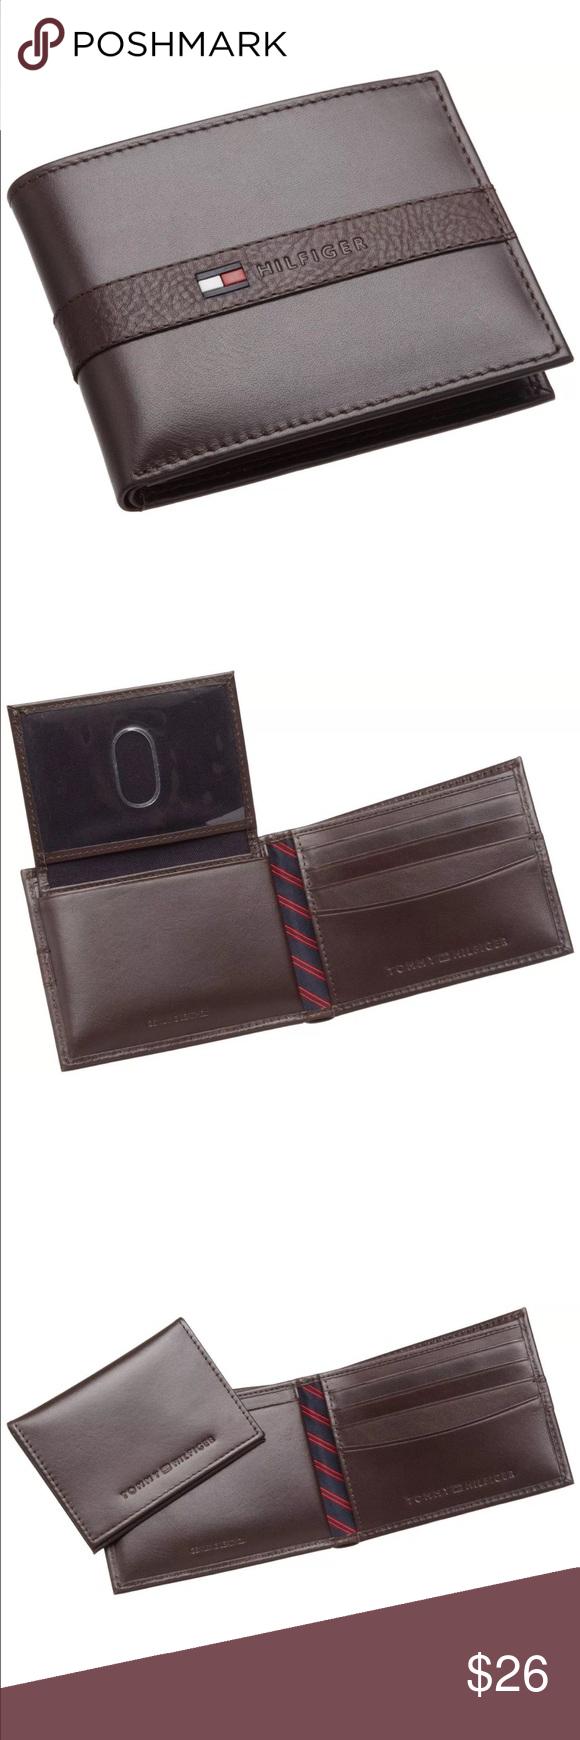 "New Tommy Hilfiger Men's Brown Leather Wallet New Tommy Hilfiger Men Wallet Color: Brown  Size: 4.2"" x 3.2"" 4 Credit Card Slots 1 Bill Slot Tommy Hilfiger Bags Wallets"